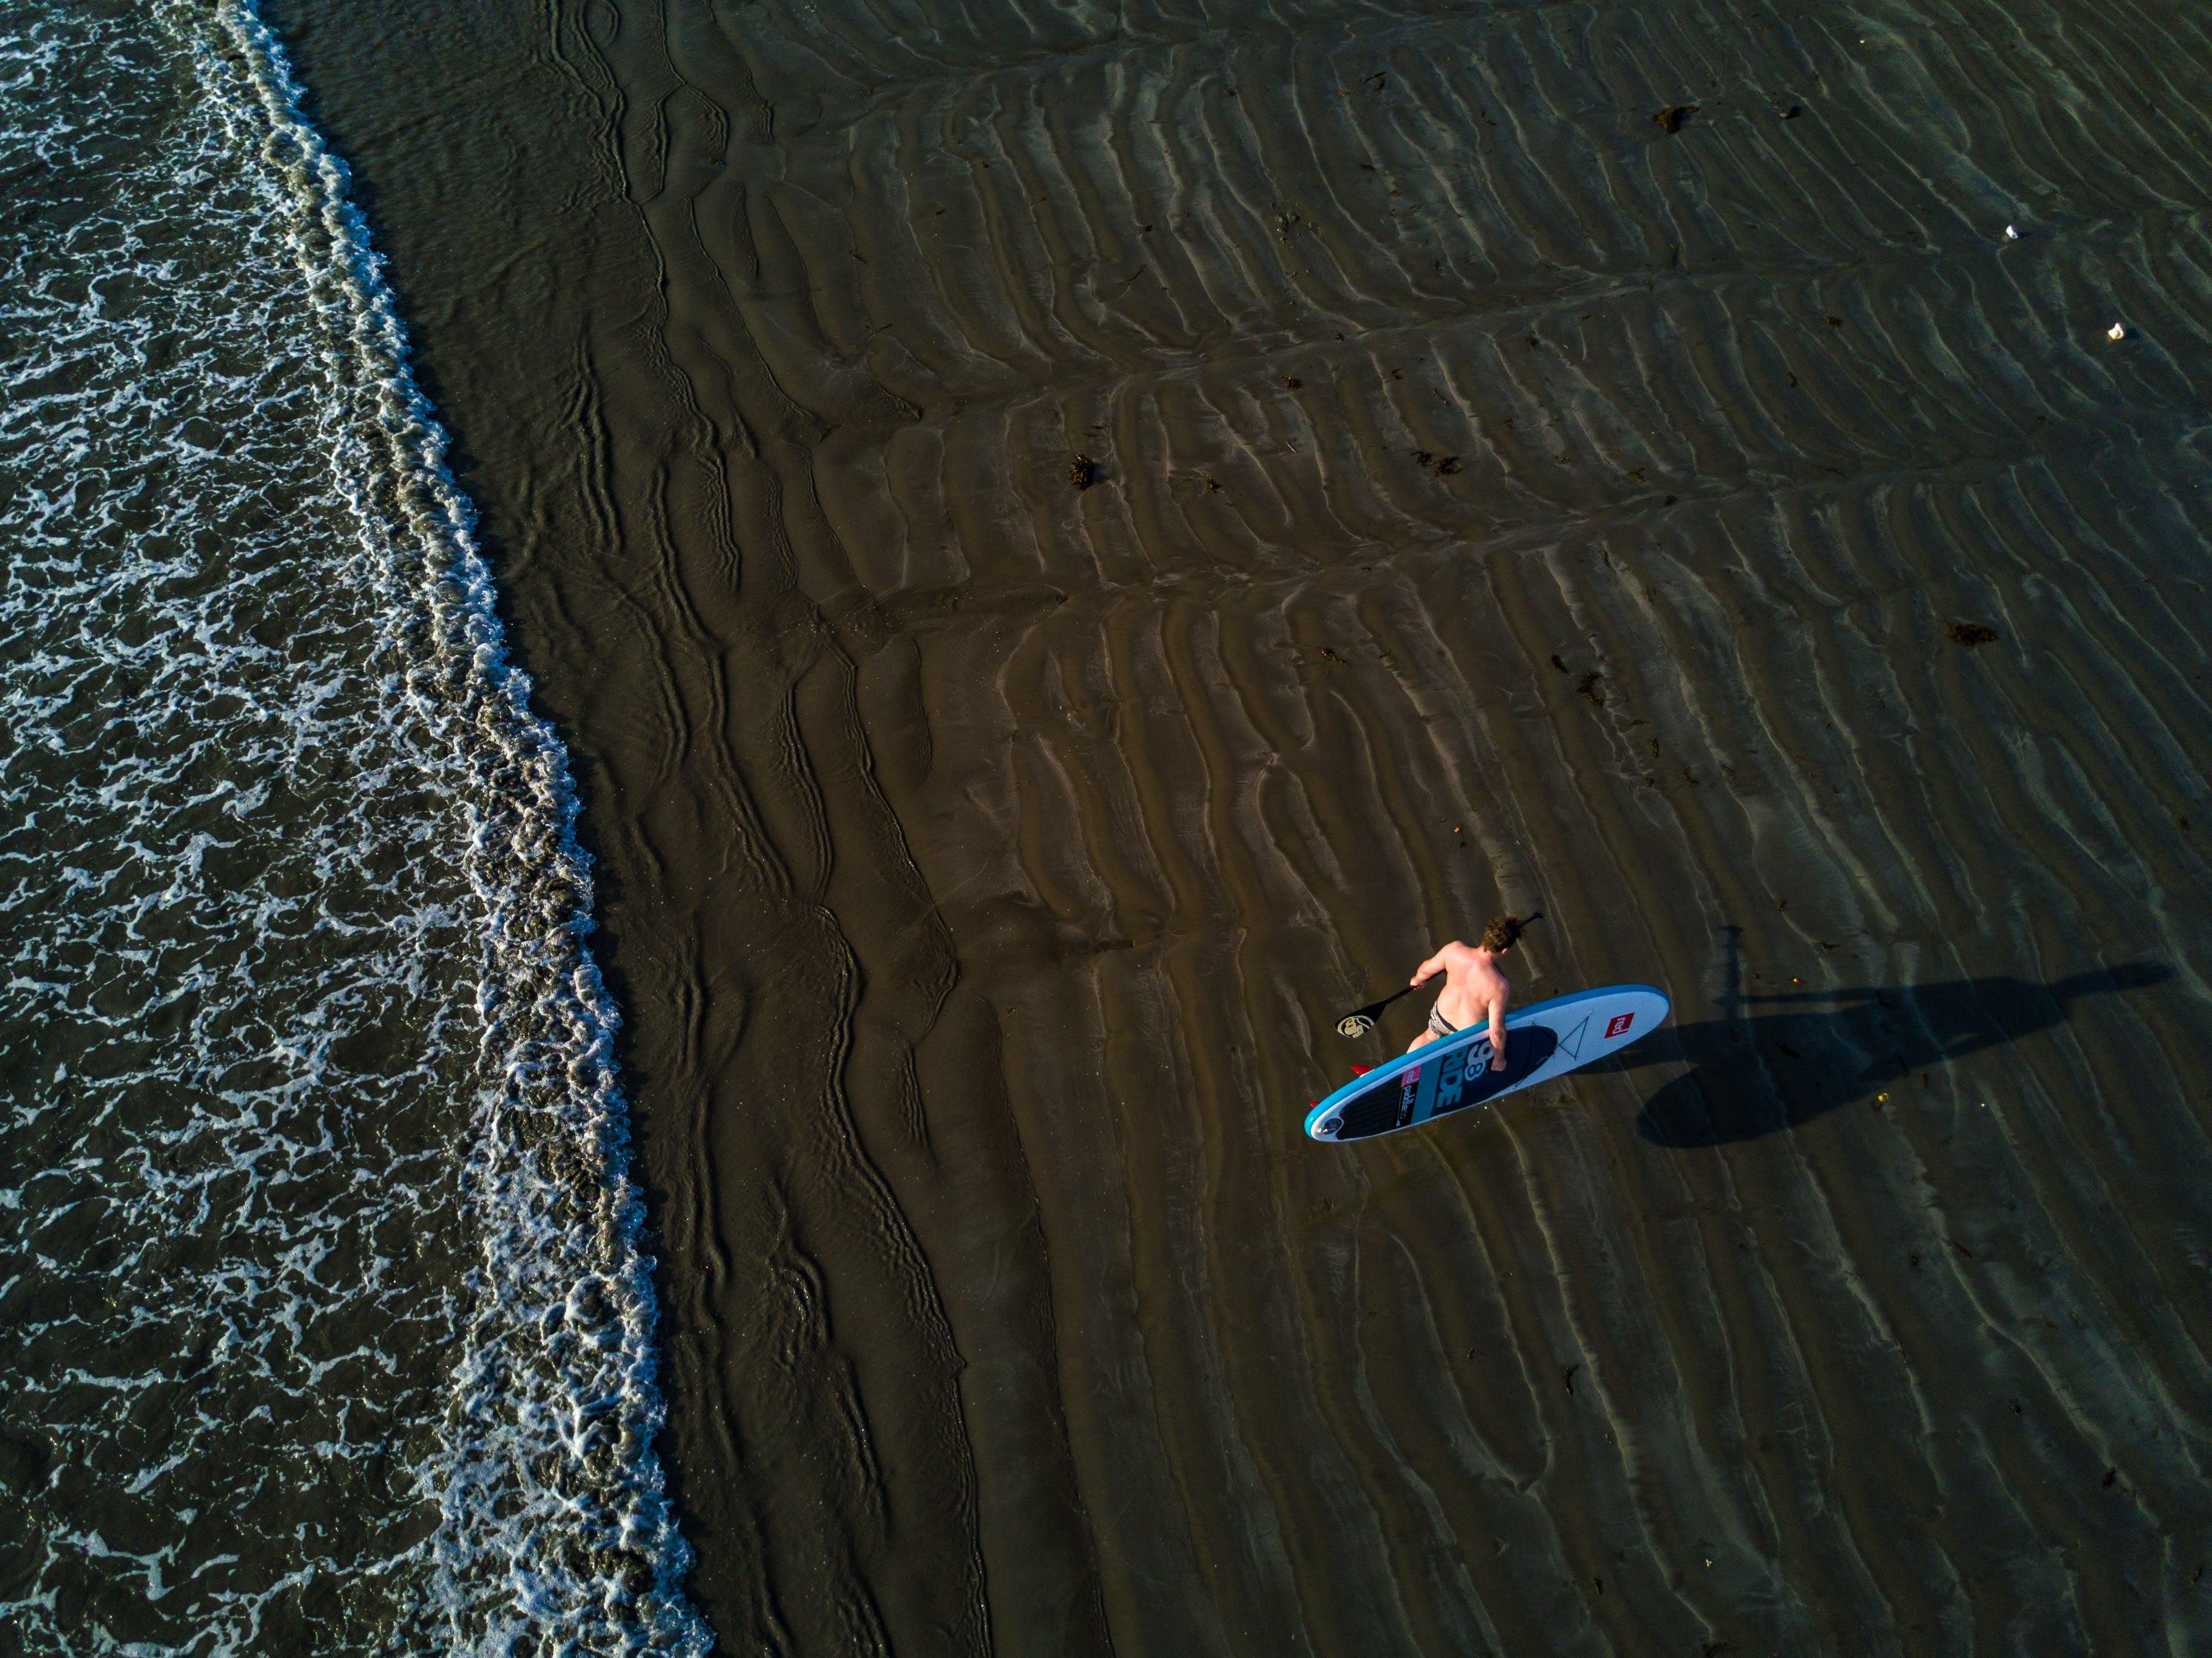 Person Holding Surfboard Near Seashore